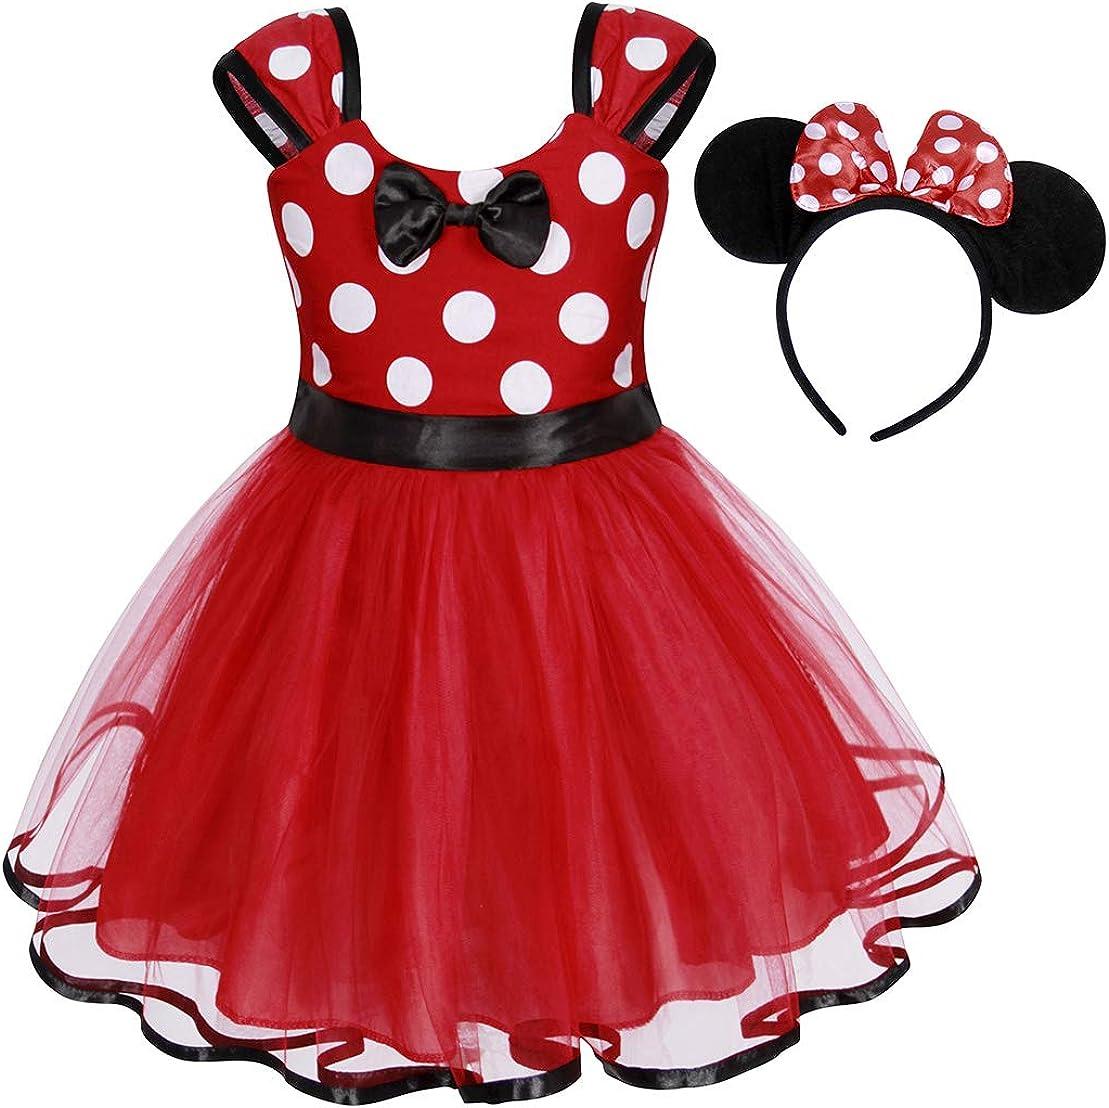 Jurebecia Filles Toddler Polka Dot Pois Robe Princesse Bowknot Tutu Mini Mouse Ear Oreille Bandeau F/ête danniversaire Tenue 1-7 Ans